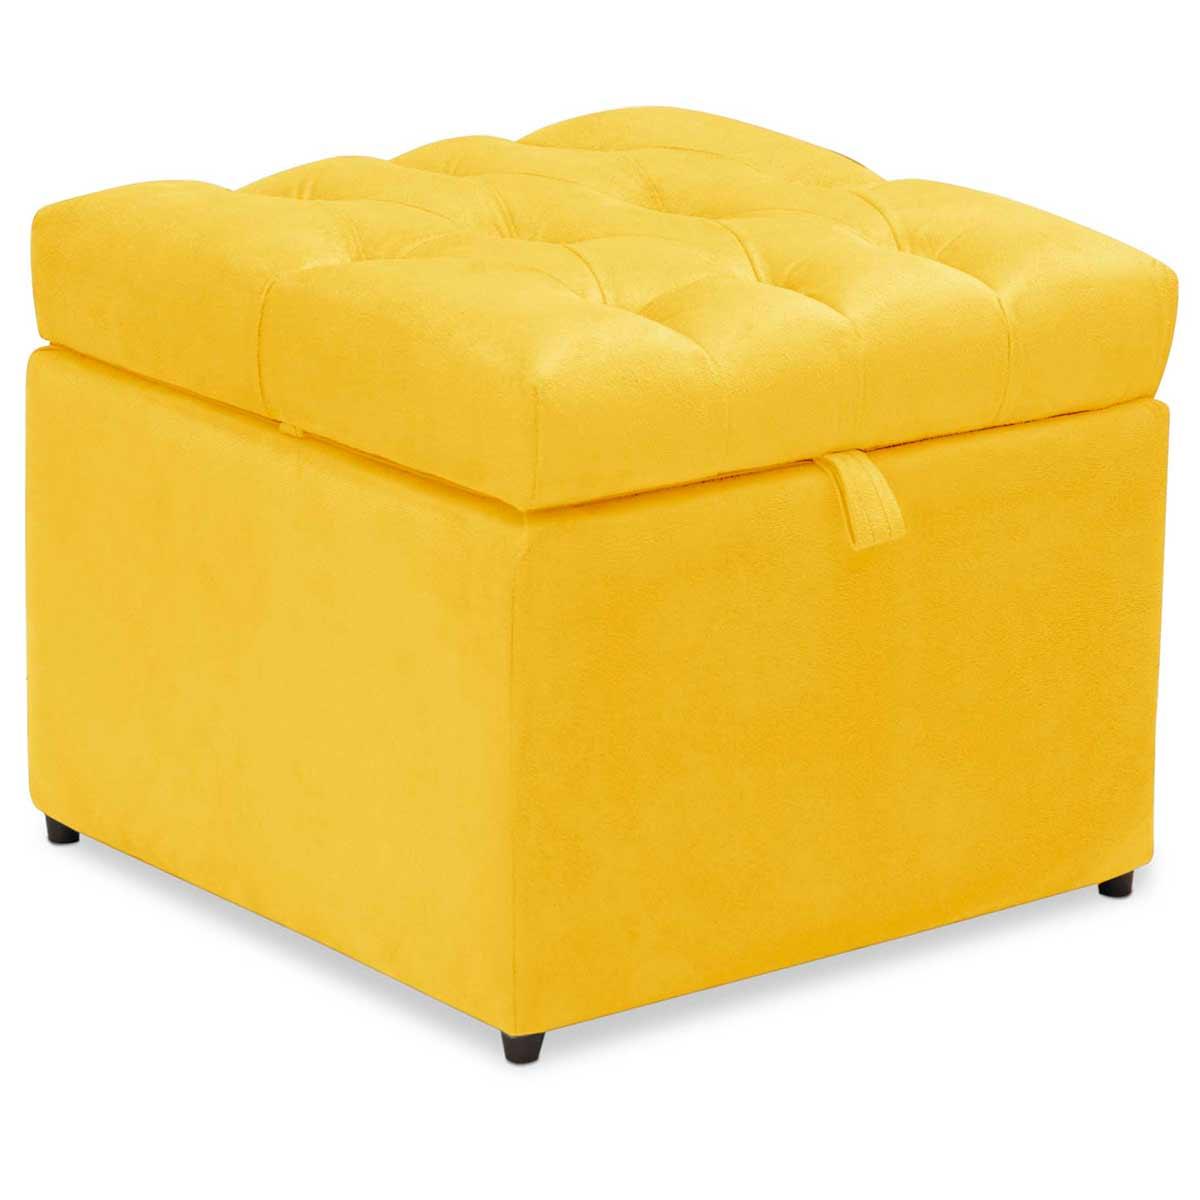 Kit 2 Puff Baú Mali Animale Amarelo Arte das Cabeceiras